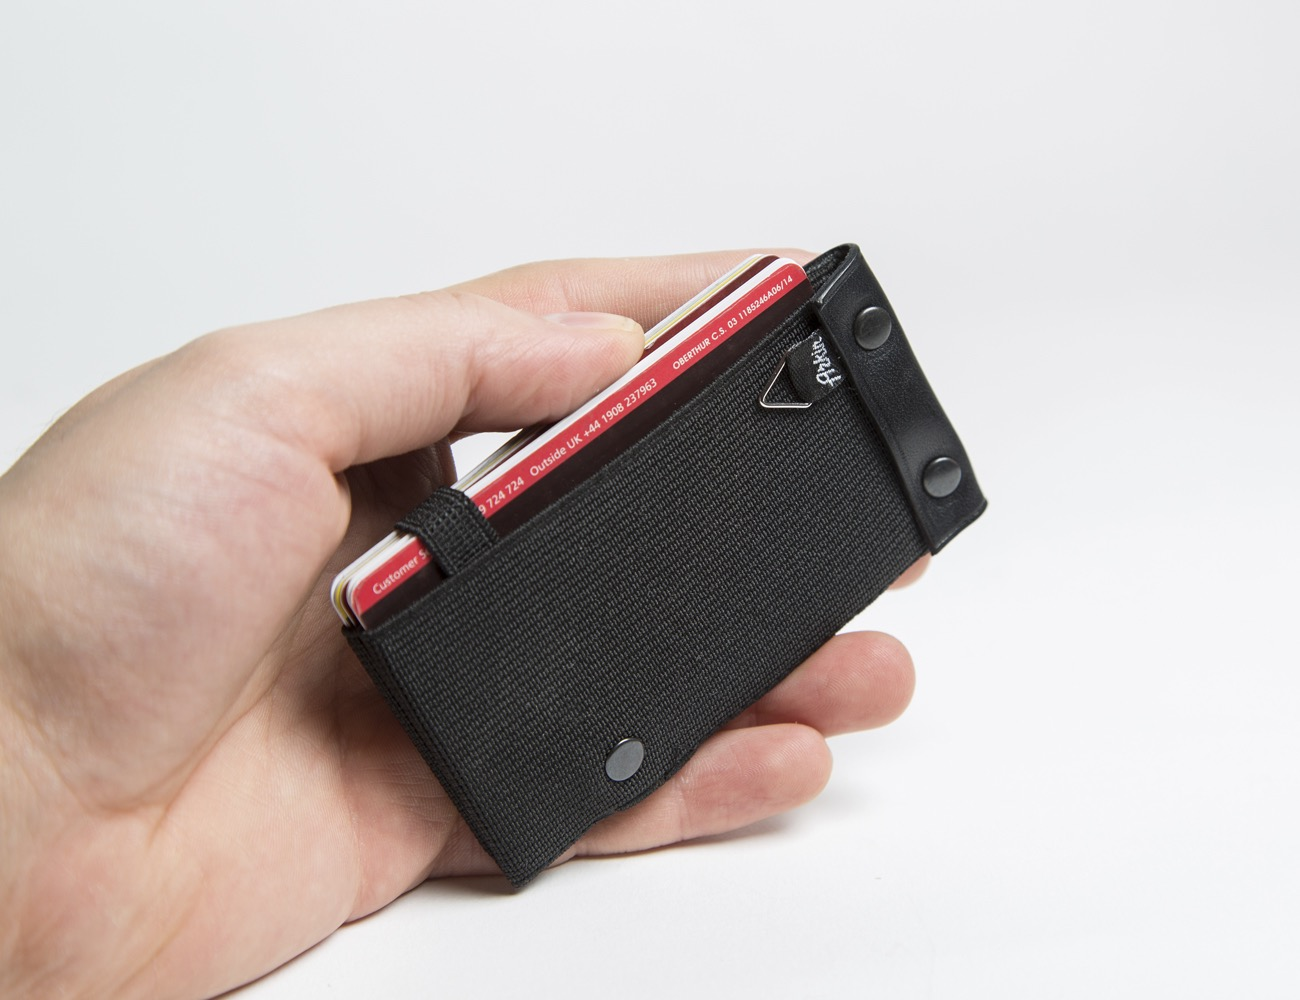 Flip+3.0+%26%238211%3B+The+Ultimate+Minimal+Card+Wallet